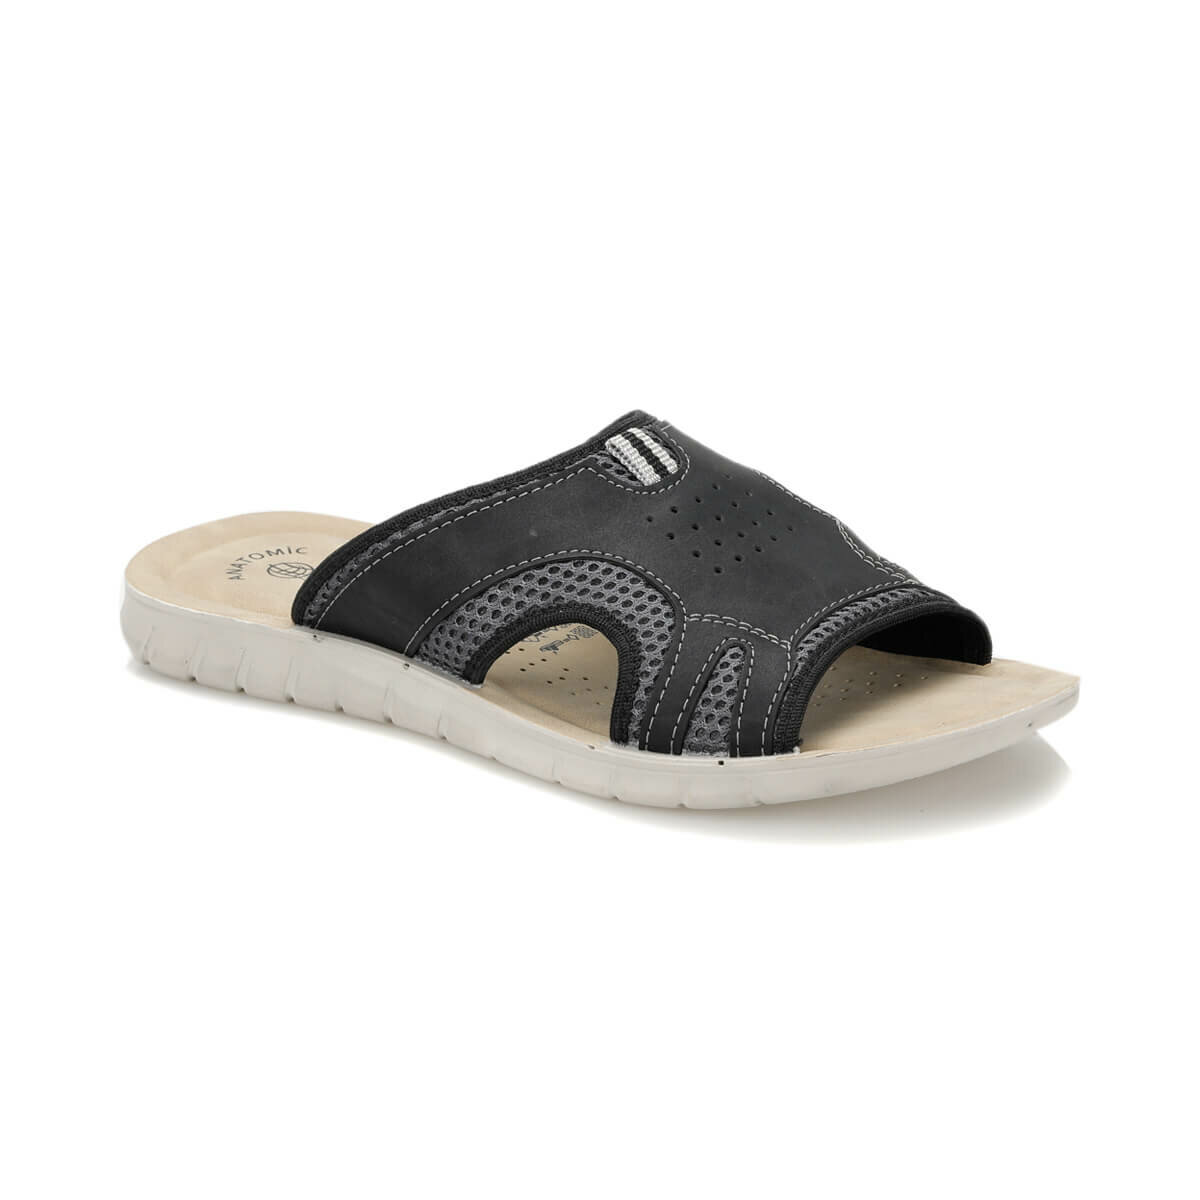 FLO ALS303 Black Male Slippers Panama Club